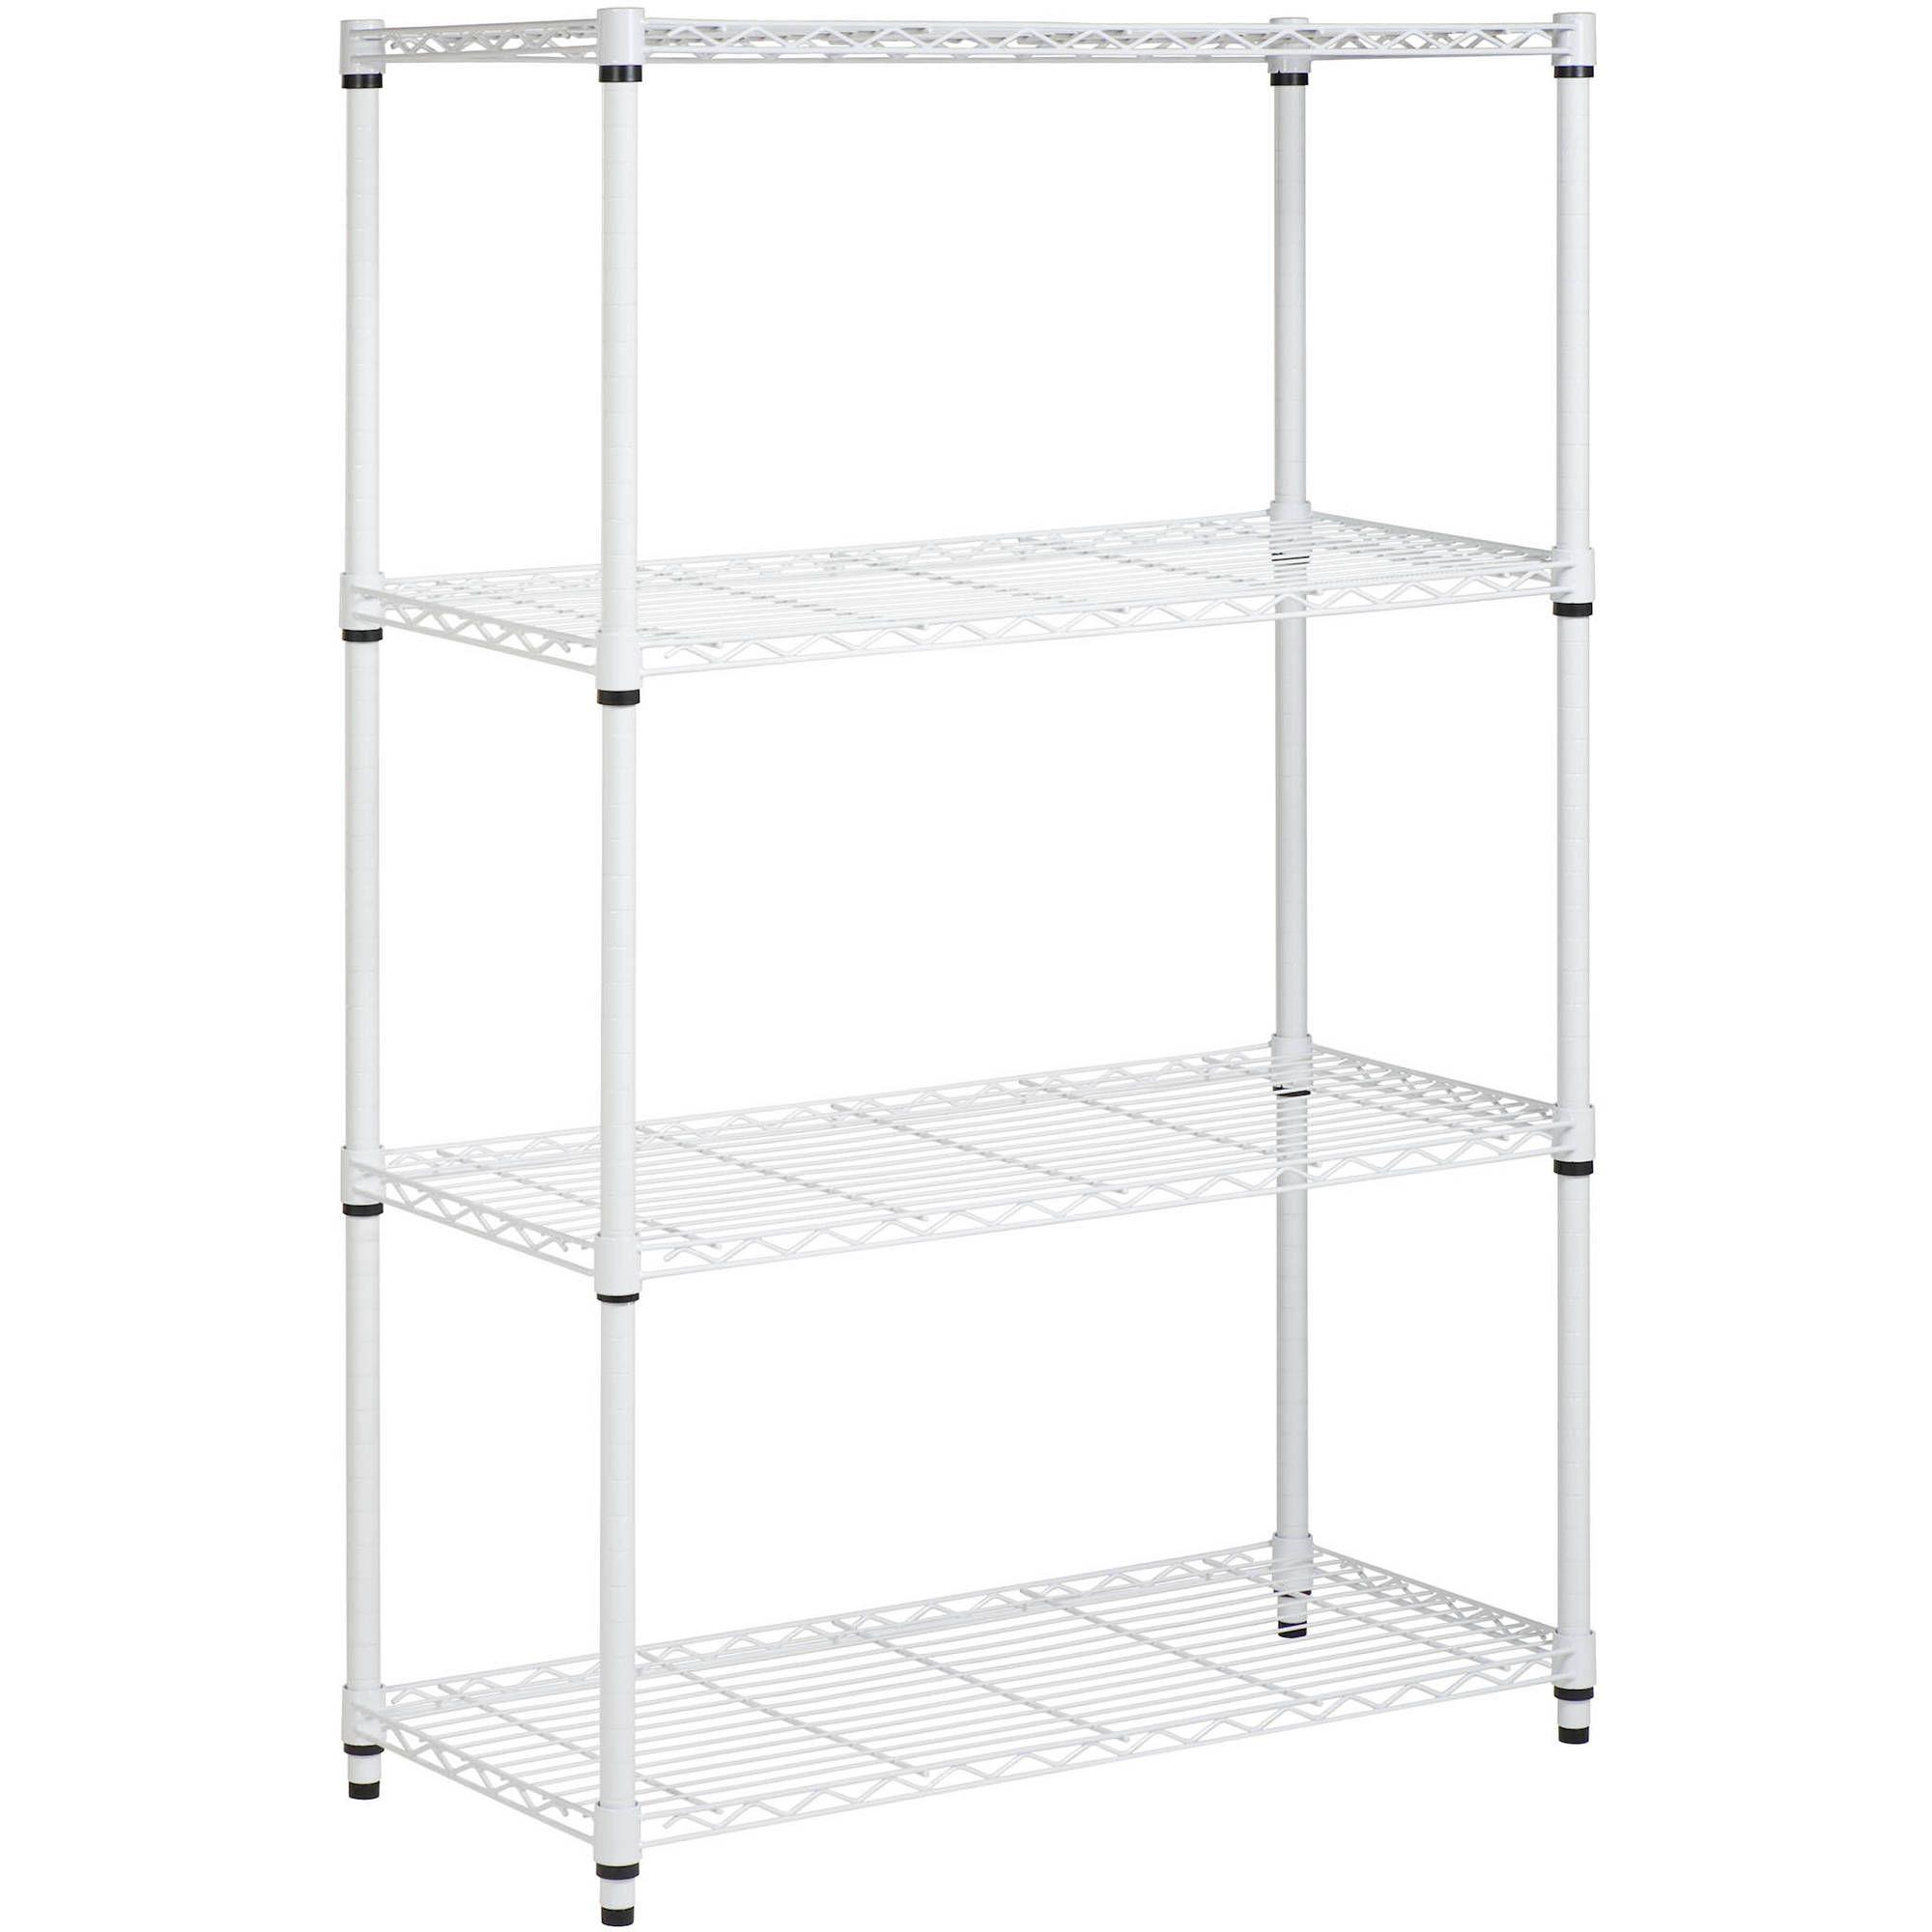 Work Choice 5-Tier Commercial Wire Shelving Rack, Zinc - Walmart.com ...